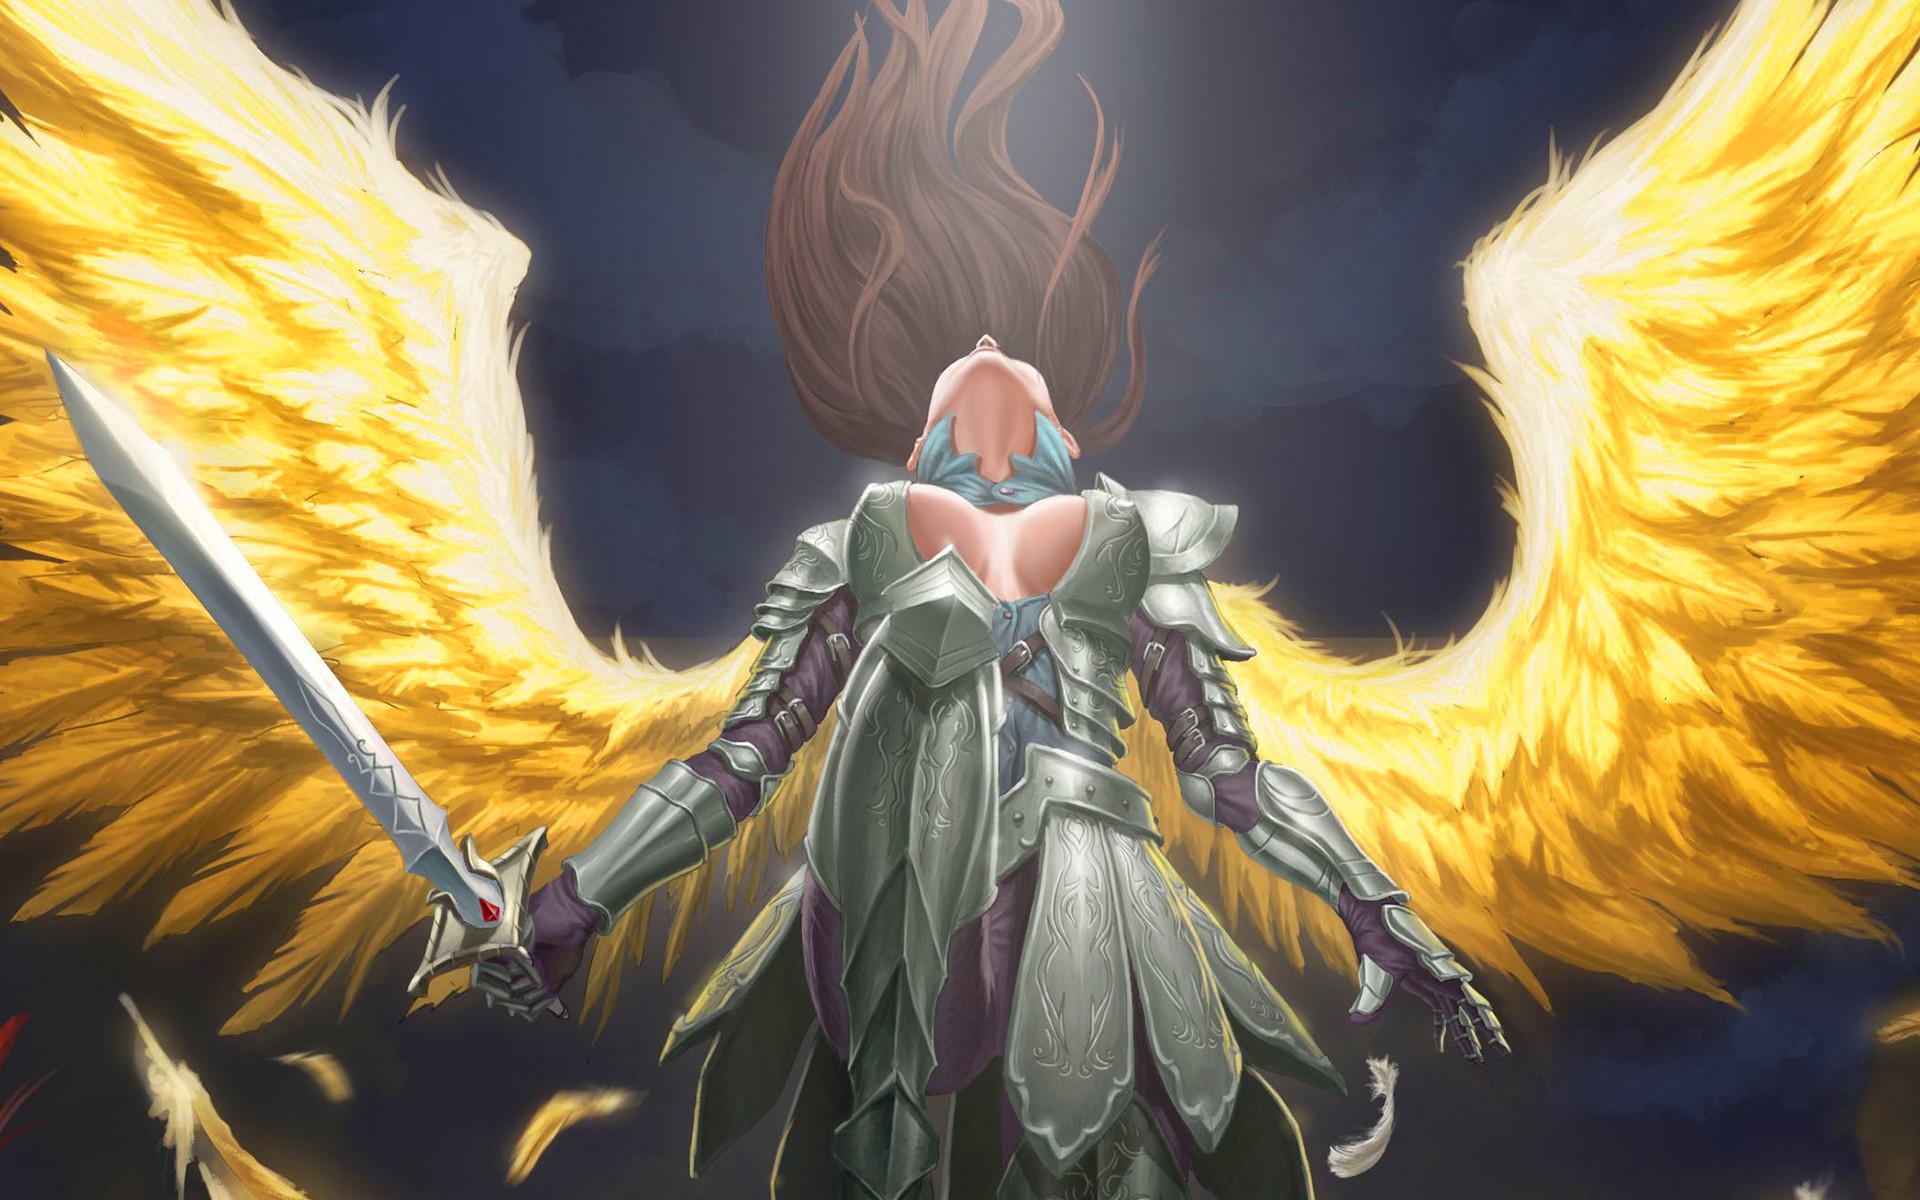 St Michael The Archangel Wallpaper ·① WallpaperTag